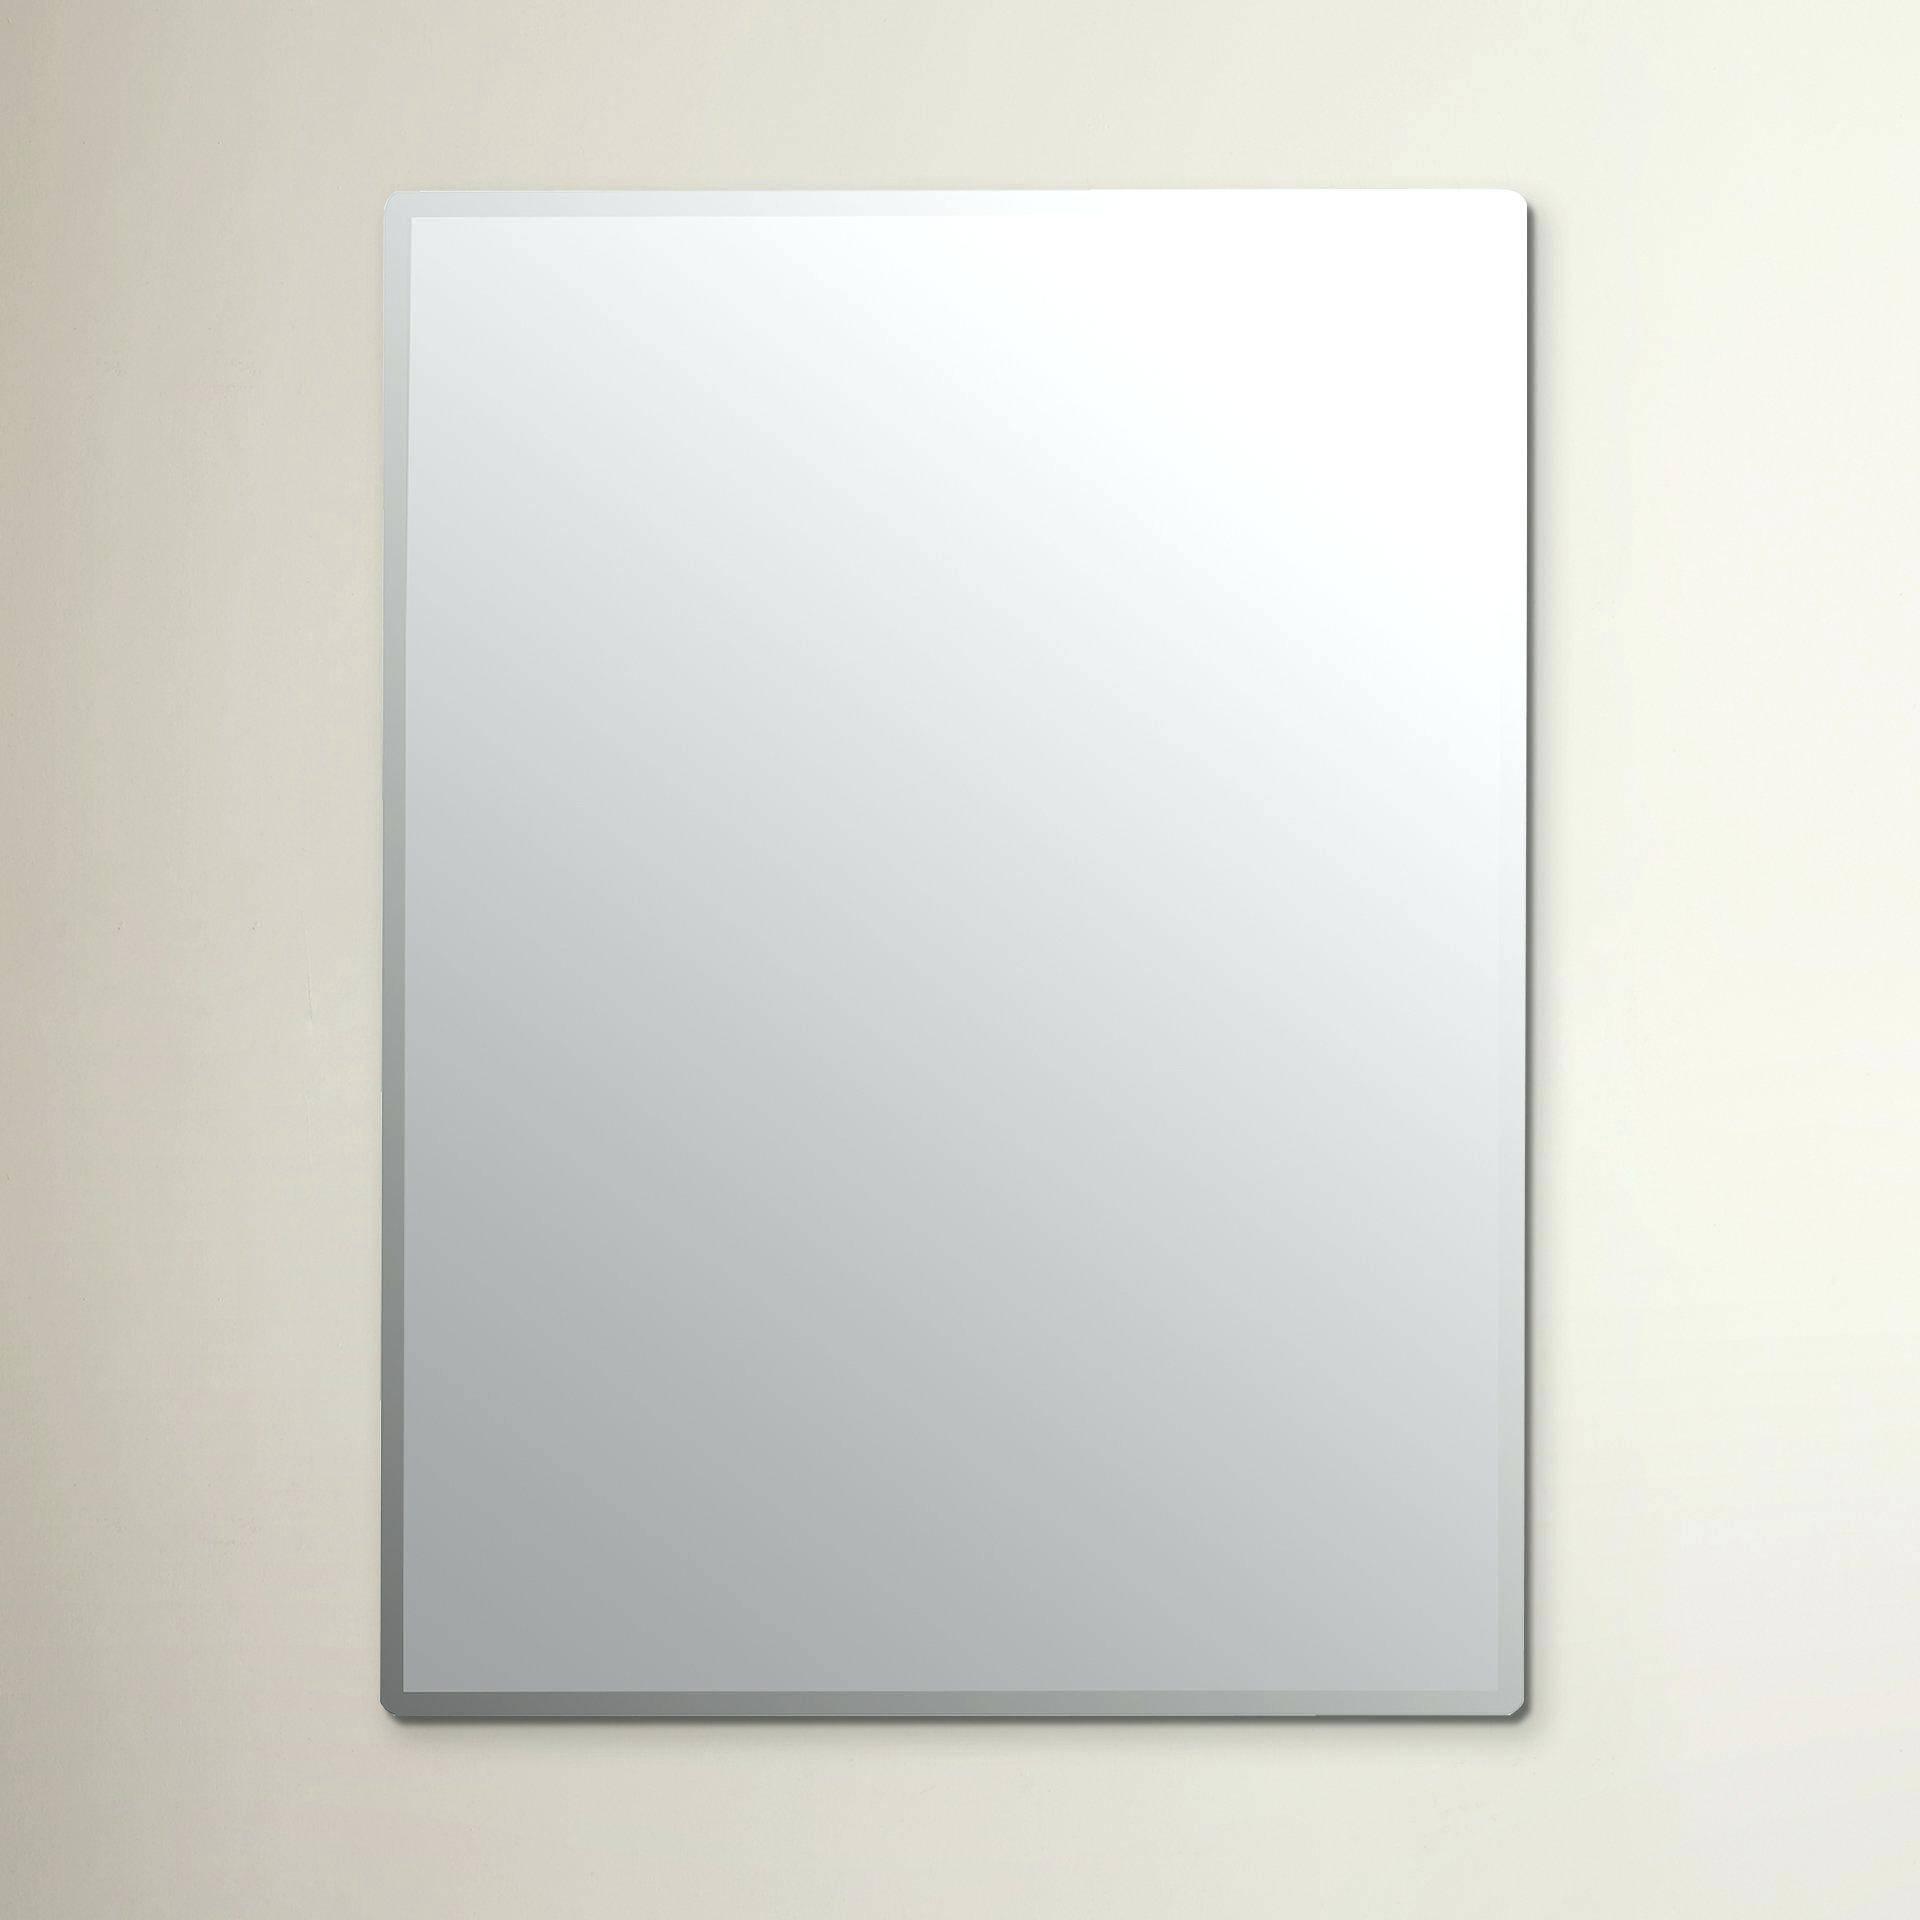 Large Frameless Beveled Wall Mirror Full Length Singapore – Shopwiz intended for Large Frameless Mirrors (Image 17 of 25)